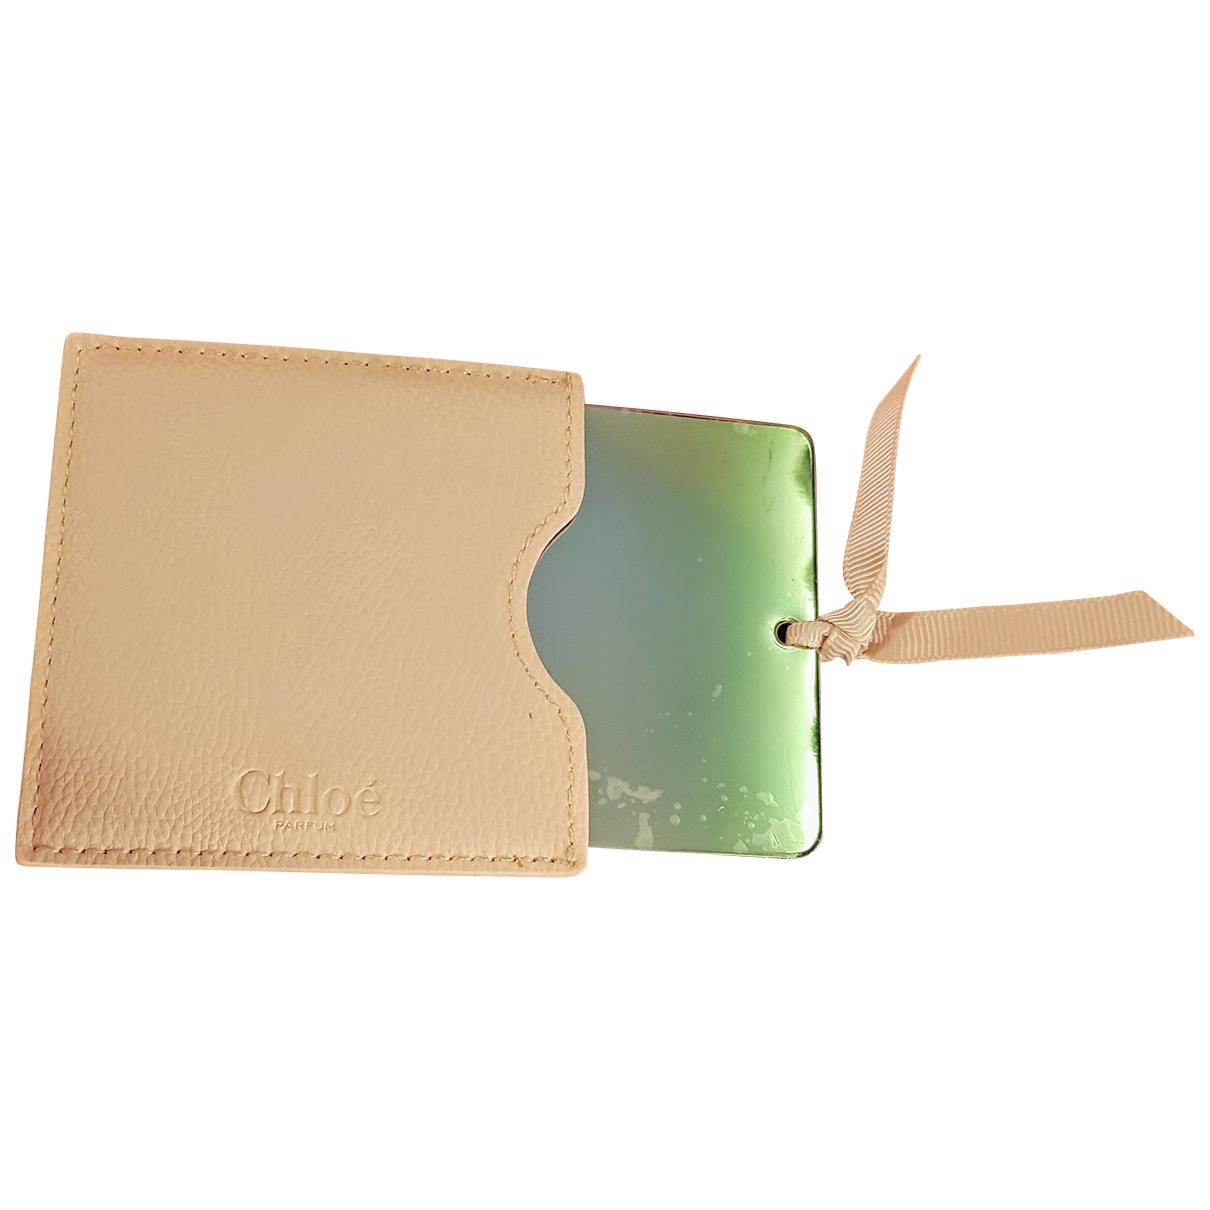 Chloe \N Accessoires und Dekoration in  Beige Leder